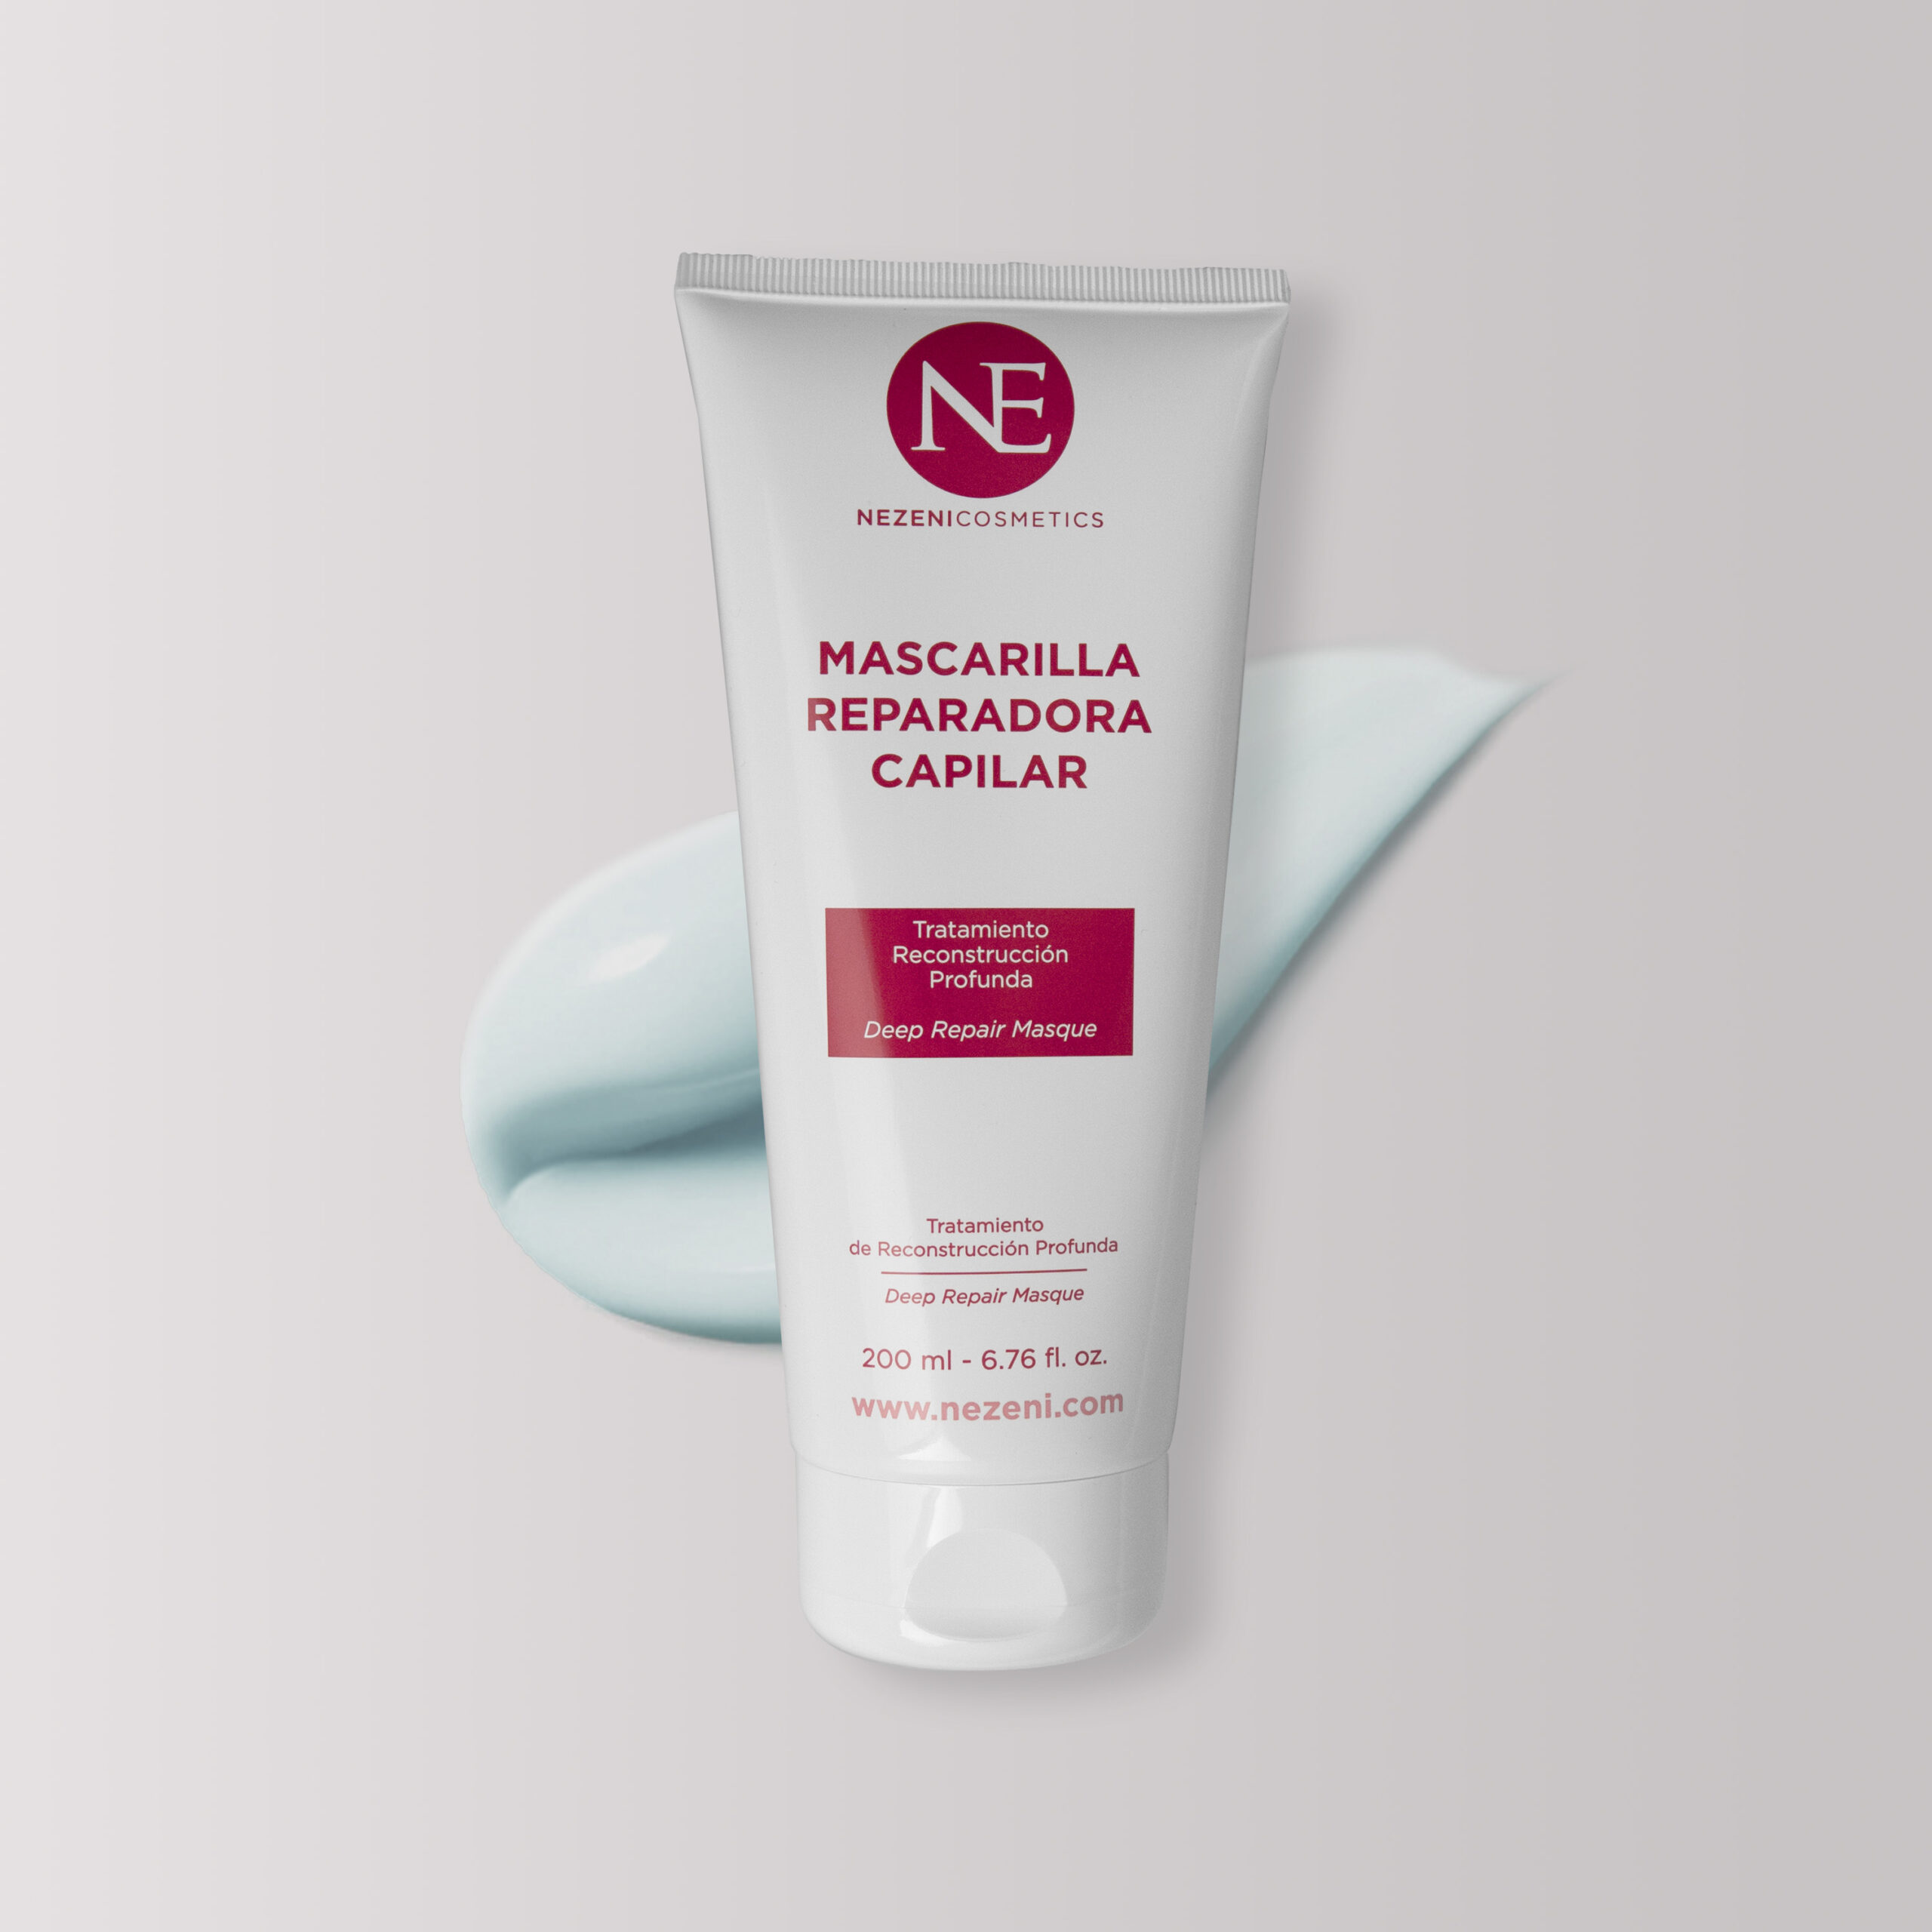 Mascarilla Capilar de Nezeni Cosmetics: mi opinión